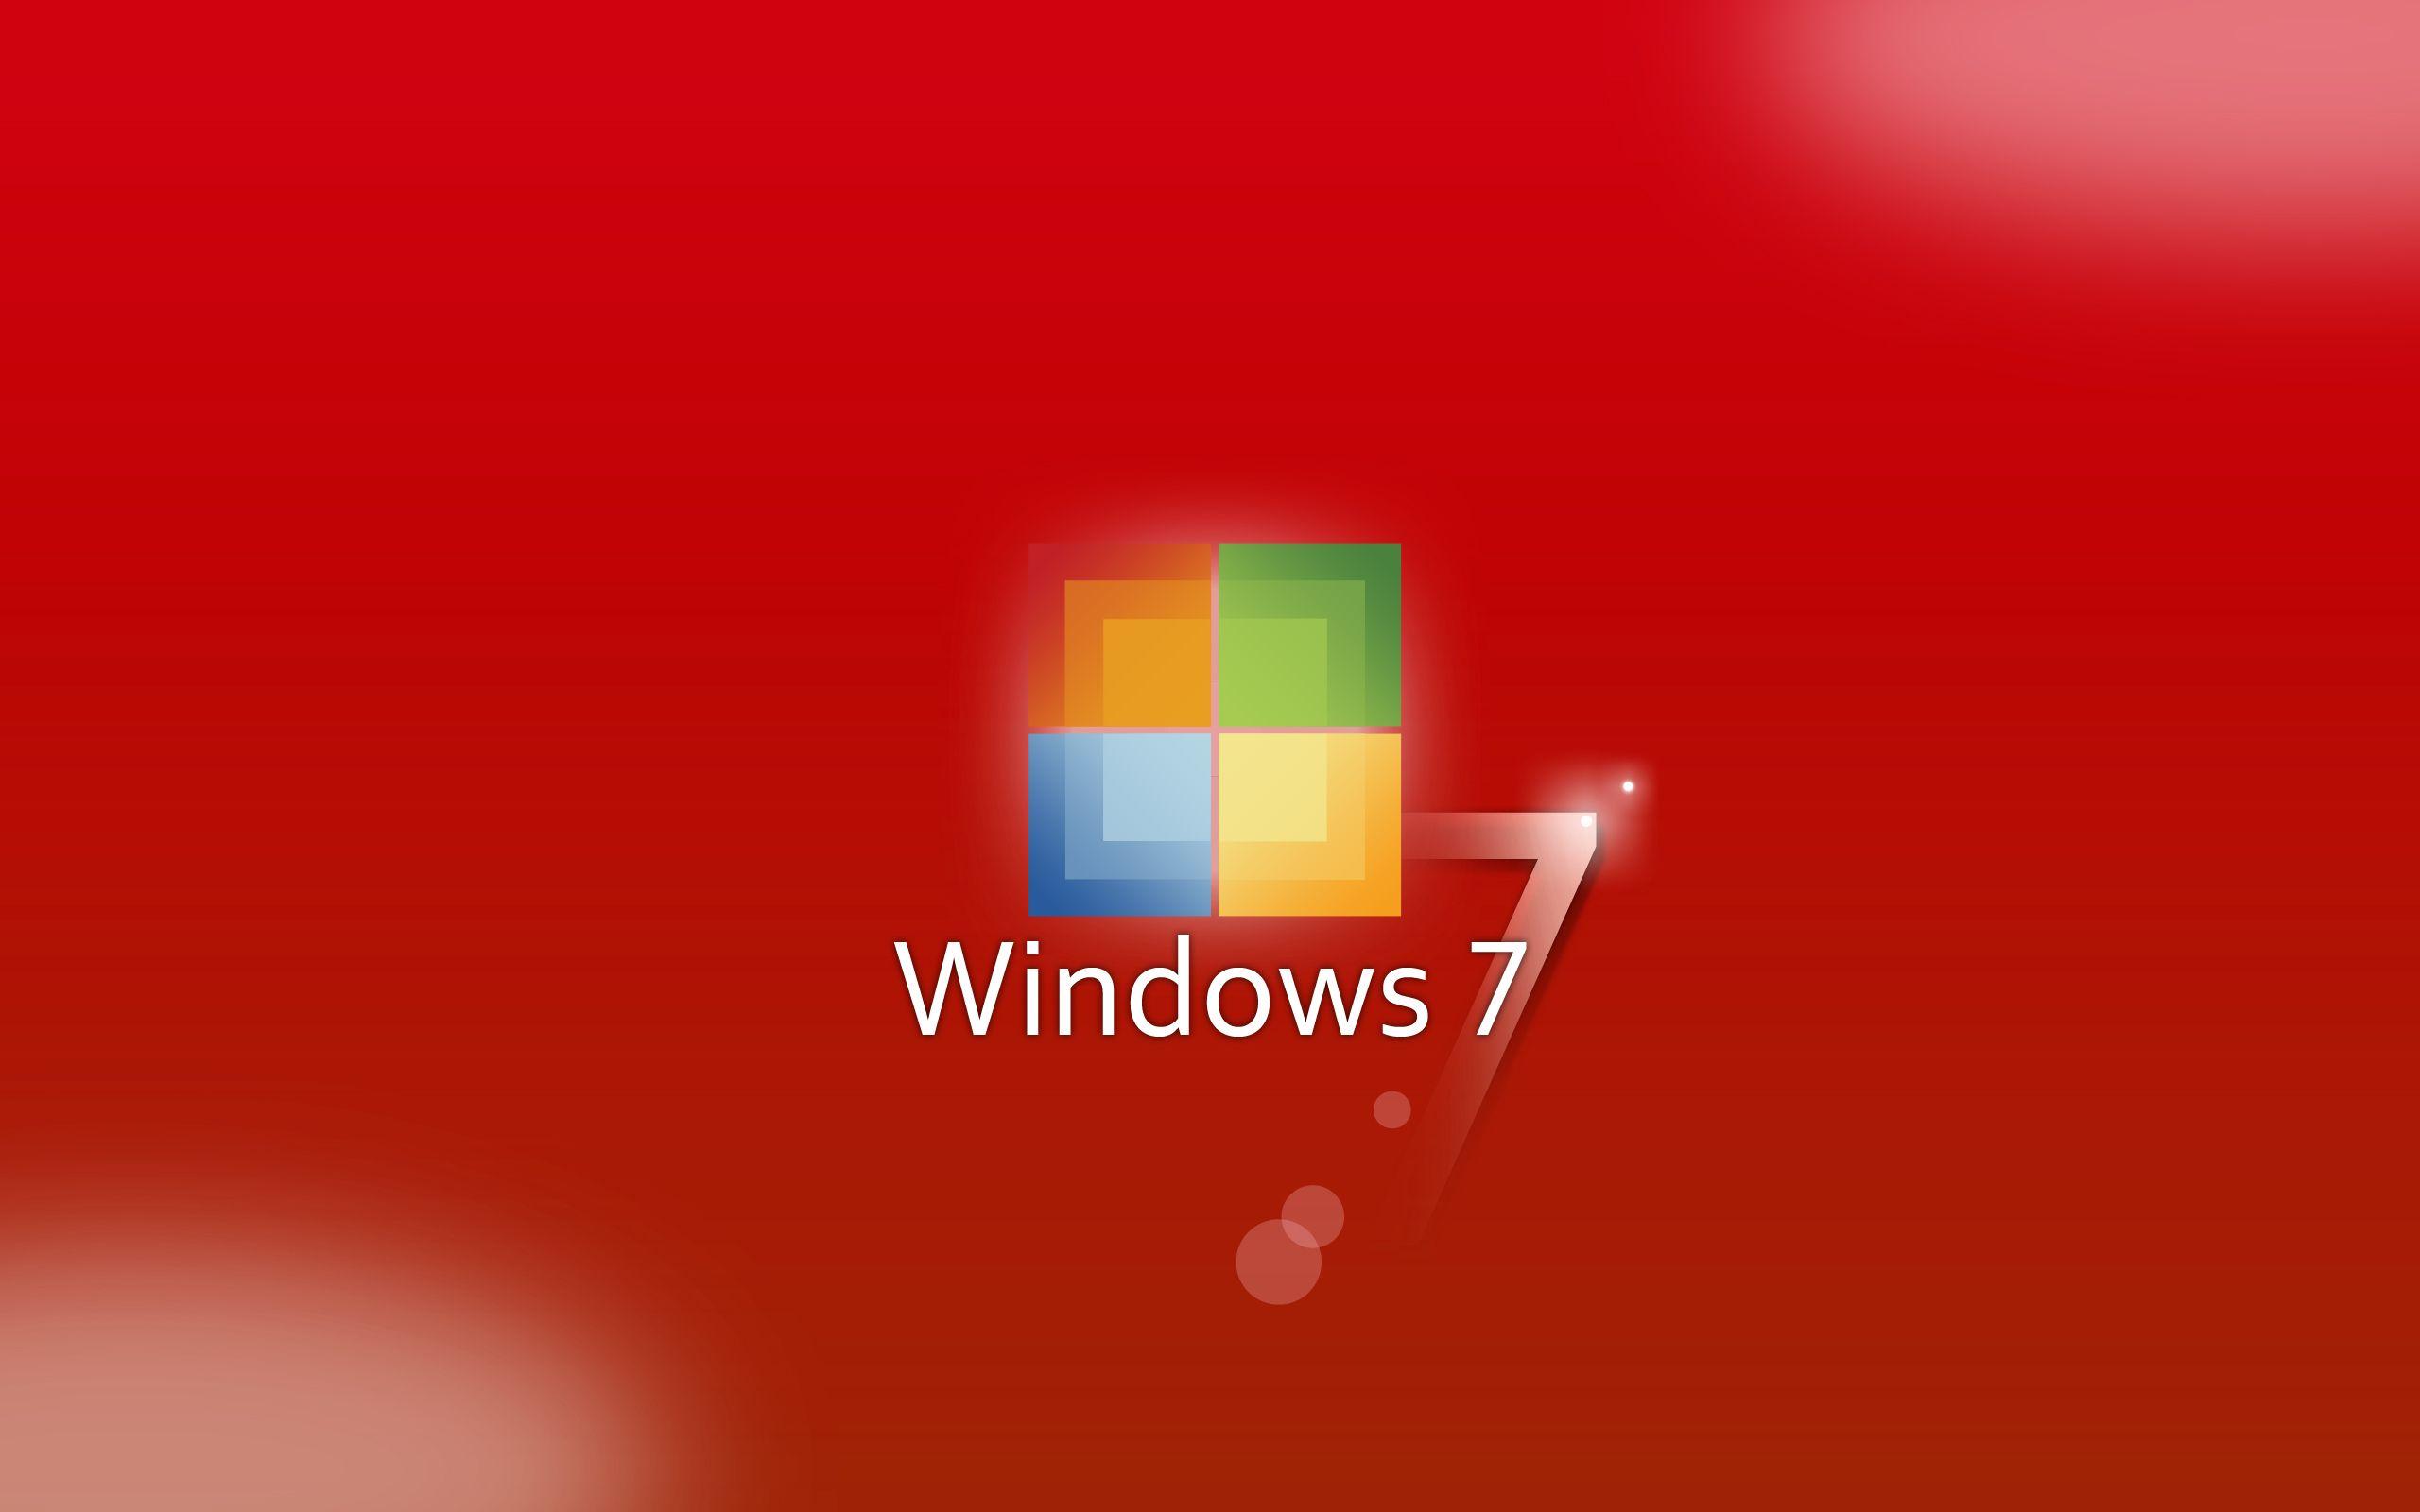 Good Old Windows 7 Wallpaper Red Wallpaper Wallpaper Pictures Window Installation